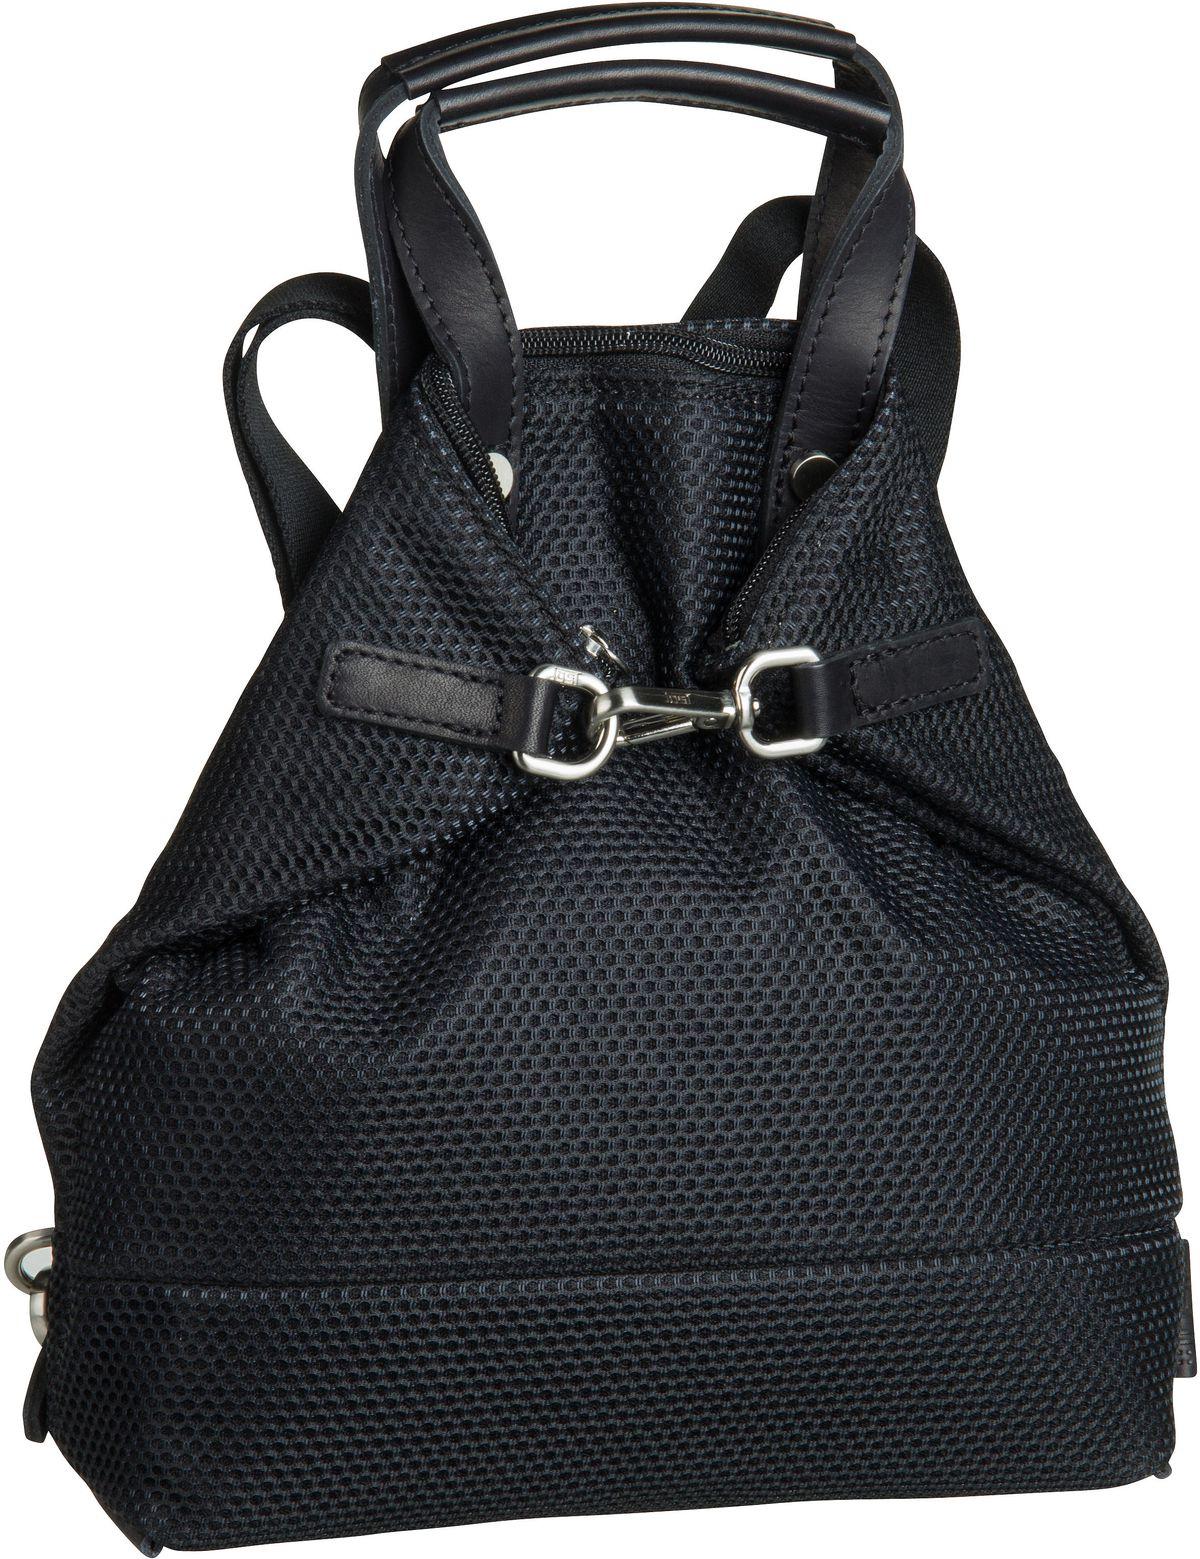 Rucksack / Daypack Mesh 6176 X-Change Bag Mini Black